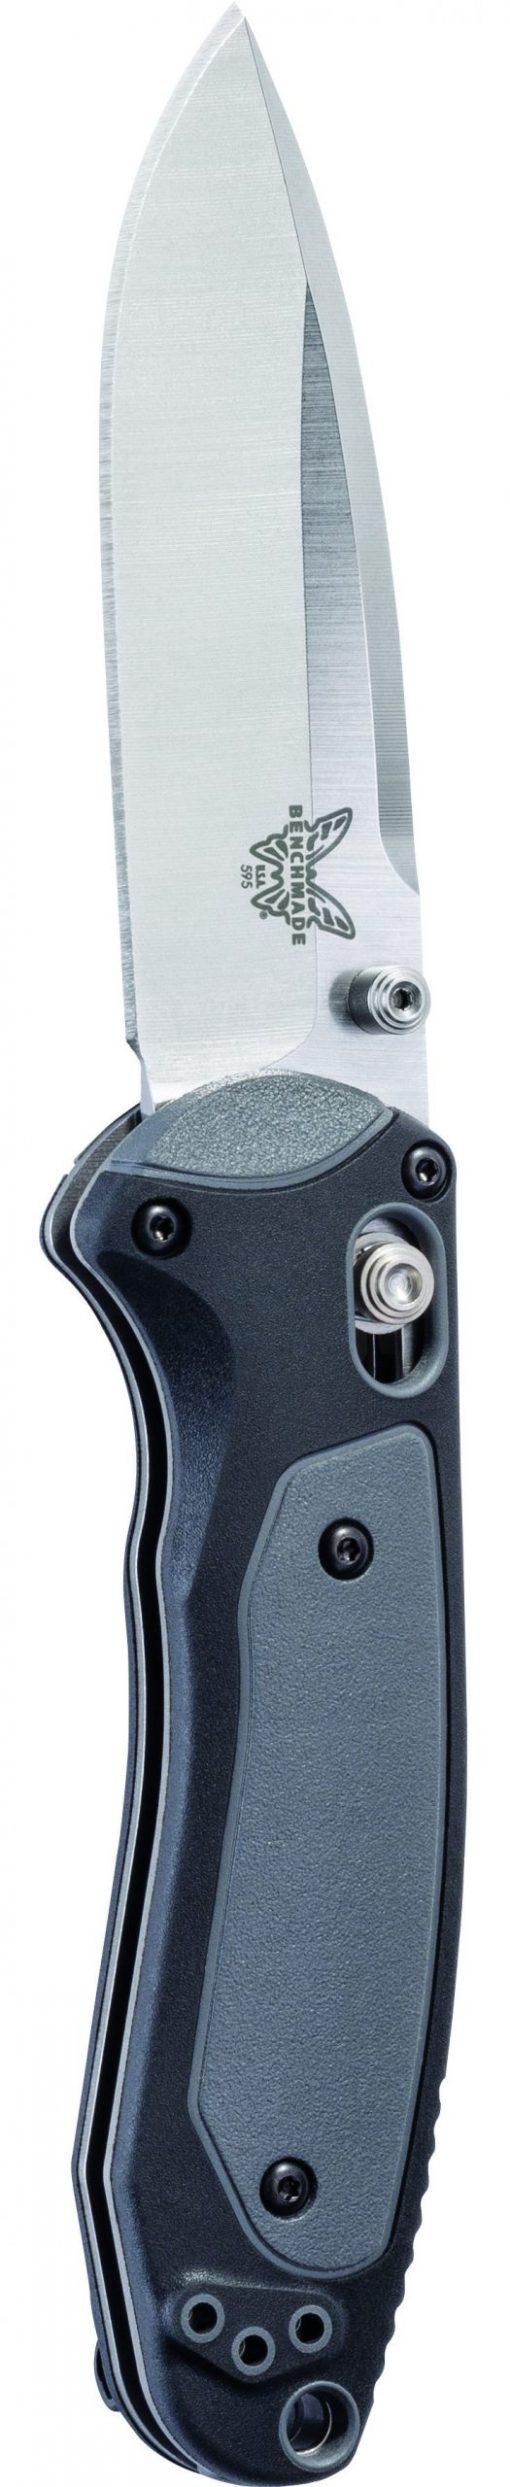 Benchmade Mini Boost S30V Blade Black/Grey Handle Front Side Tip-Up